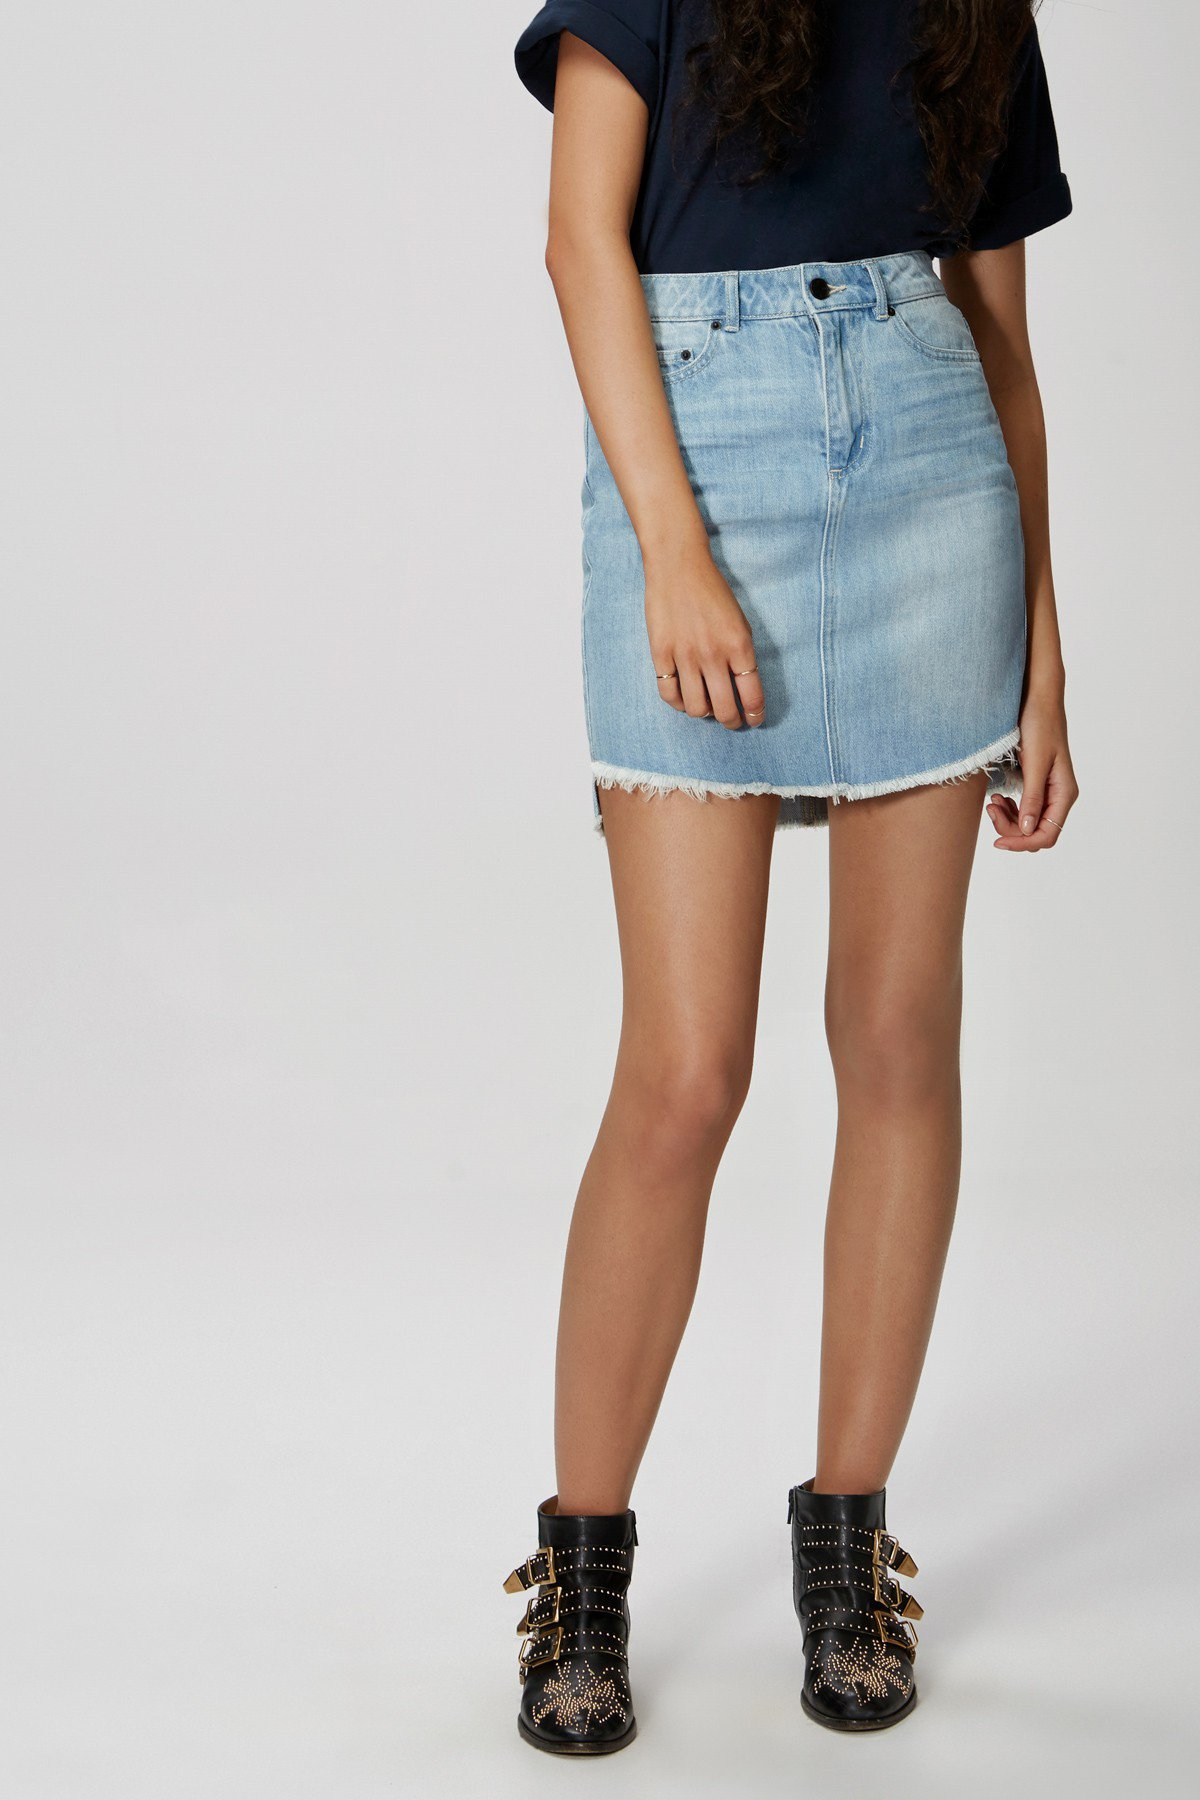 Shop The Fifth Fraya Skirt.